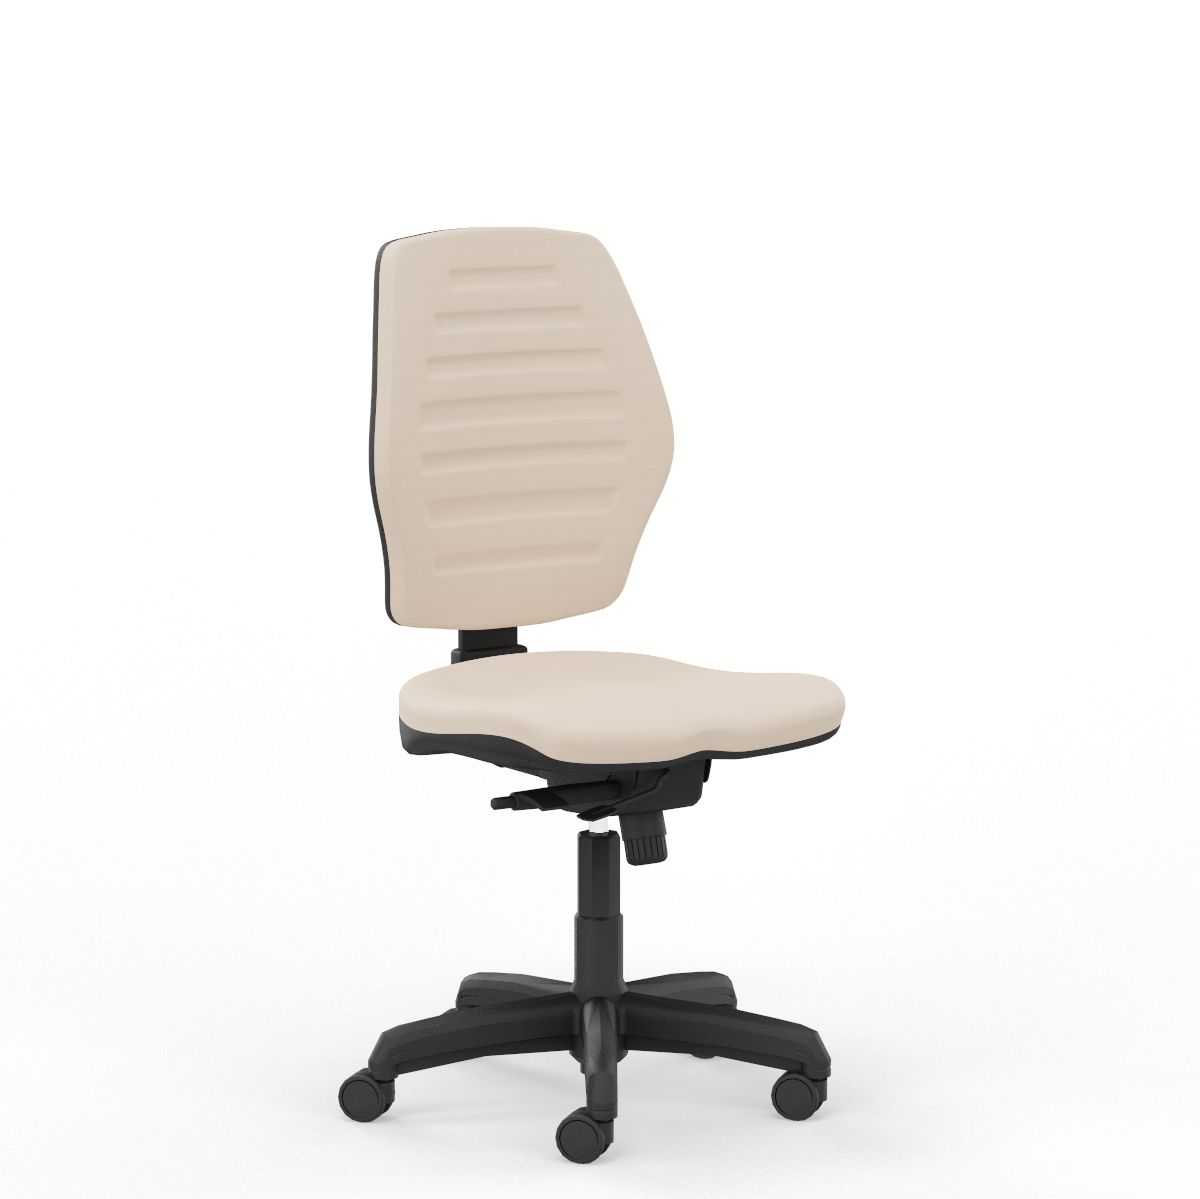 Fotel Biurowy Nowy Styl MASTER 10 TS25 IM660